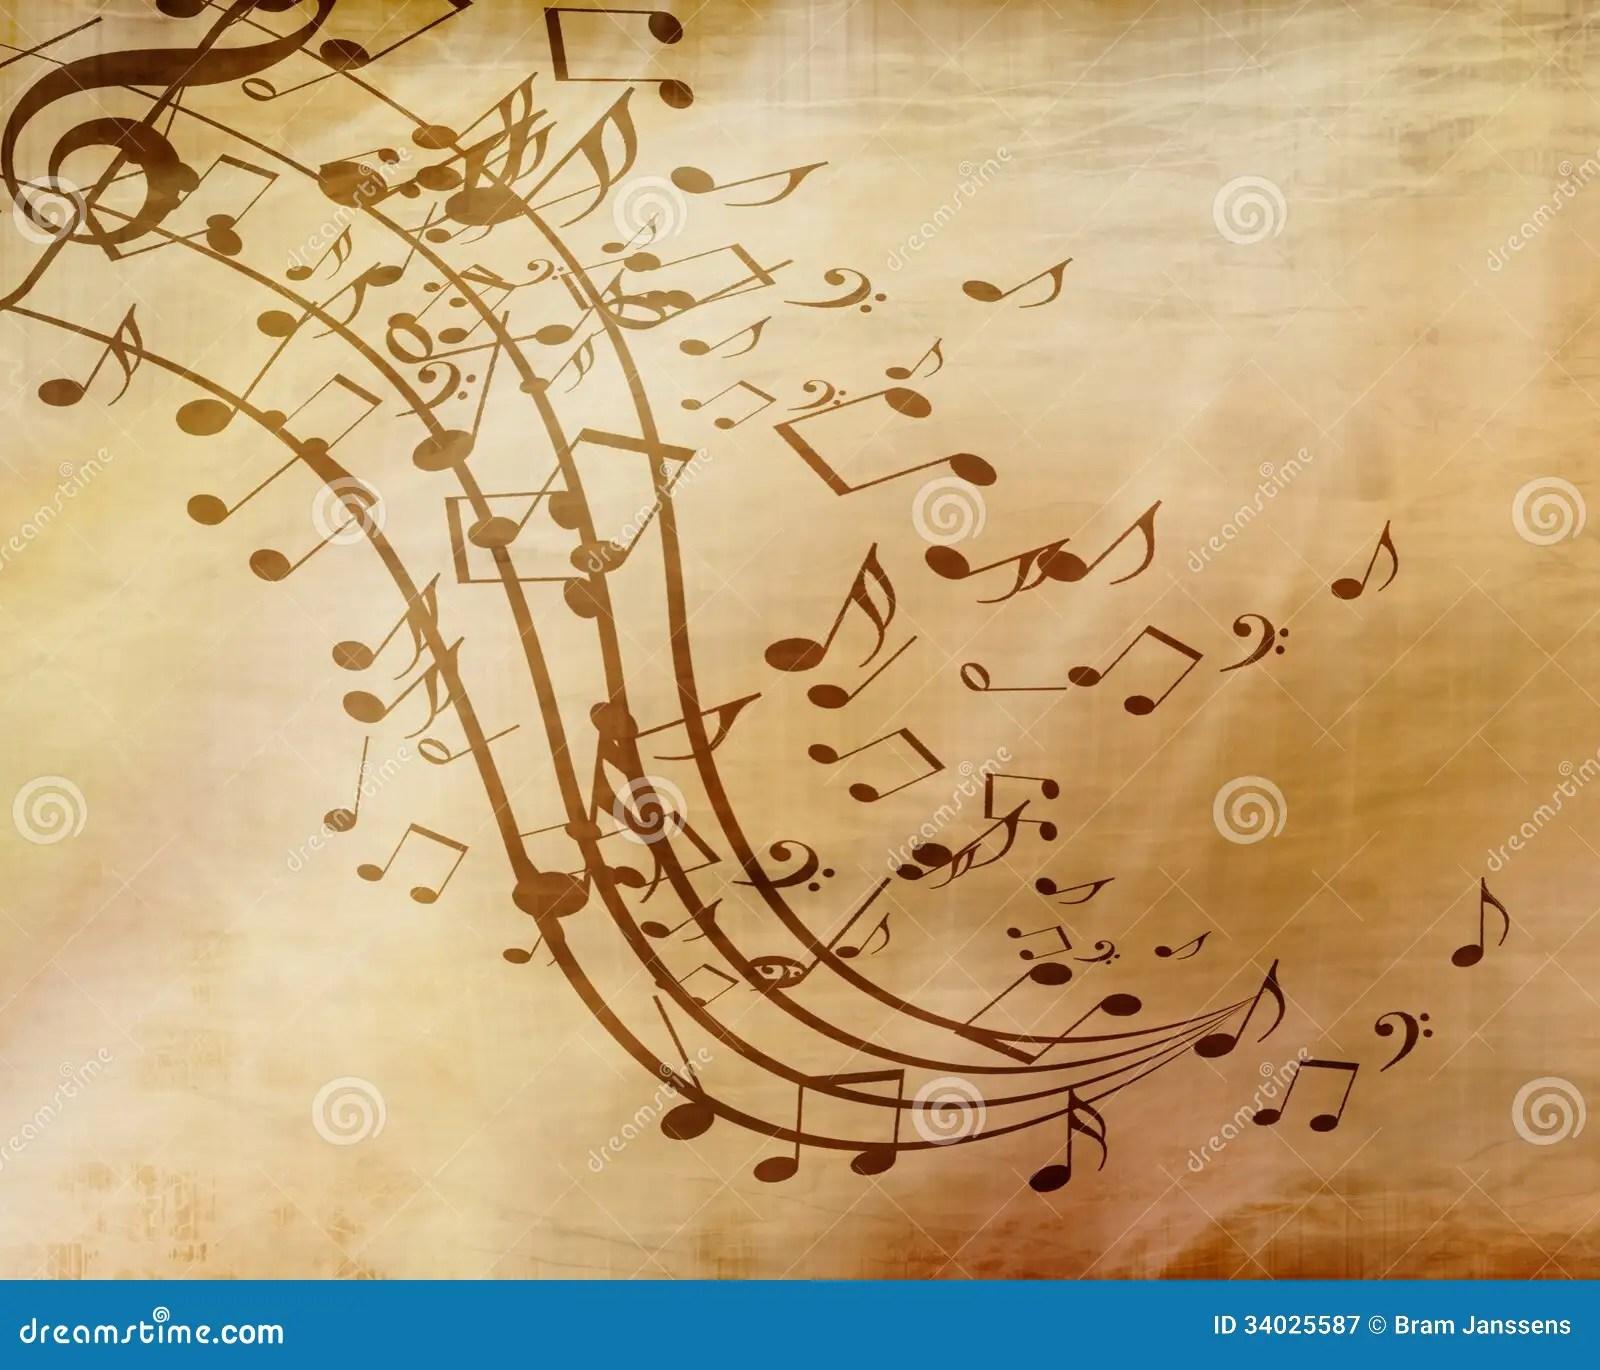 Music Sheet Royalty Free Stock Photography - Image: 34025587